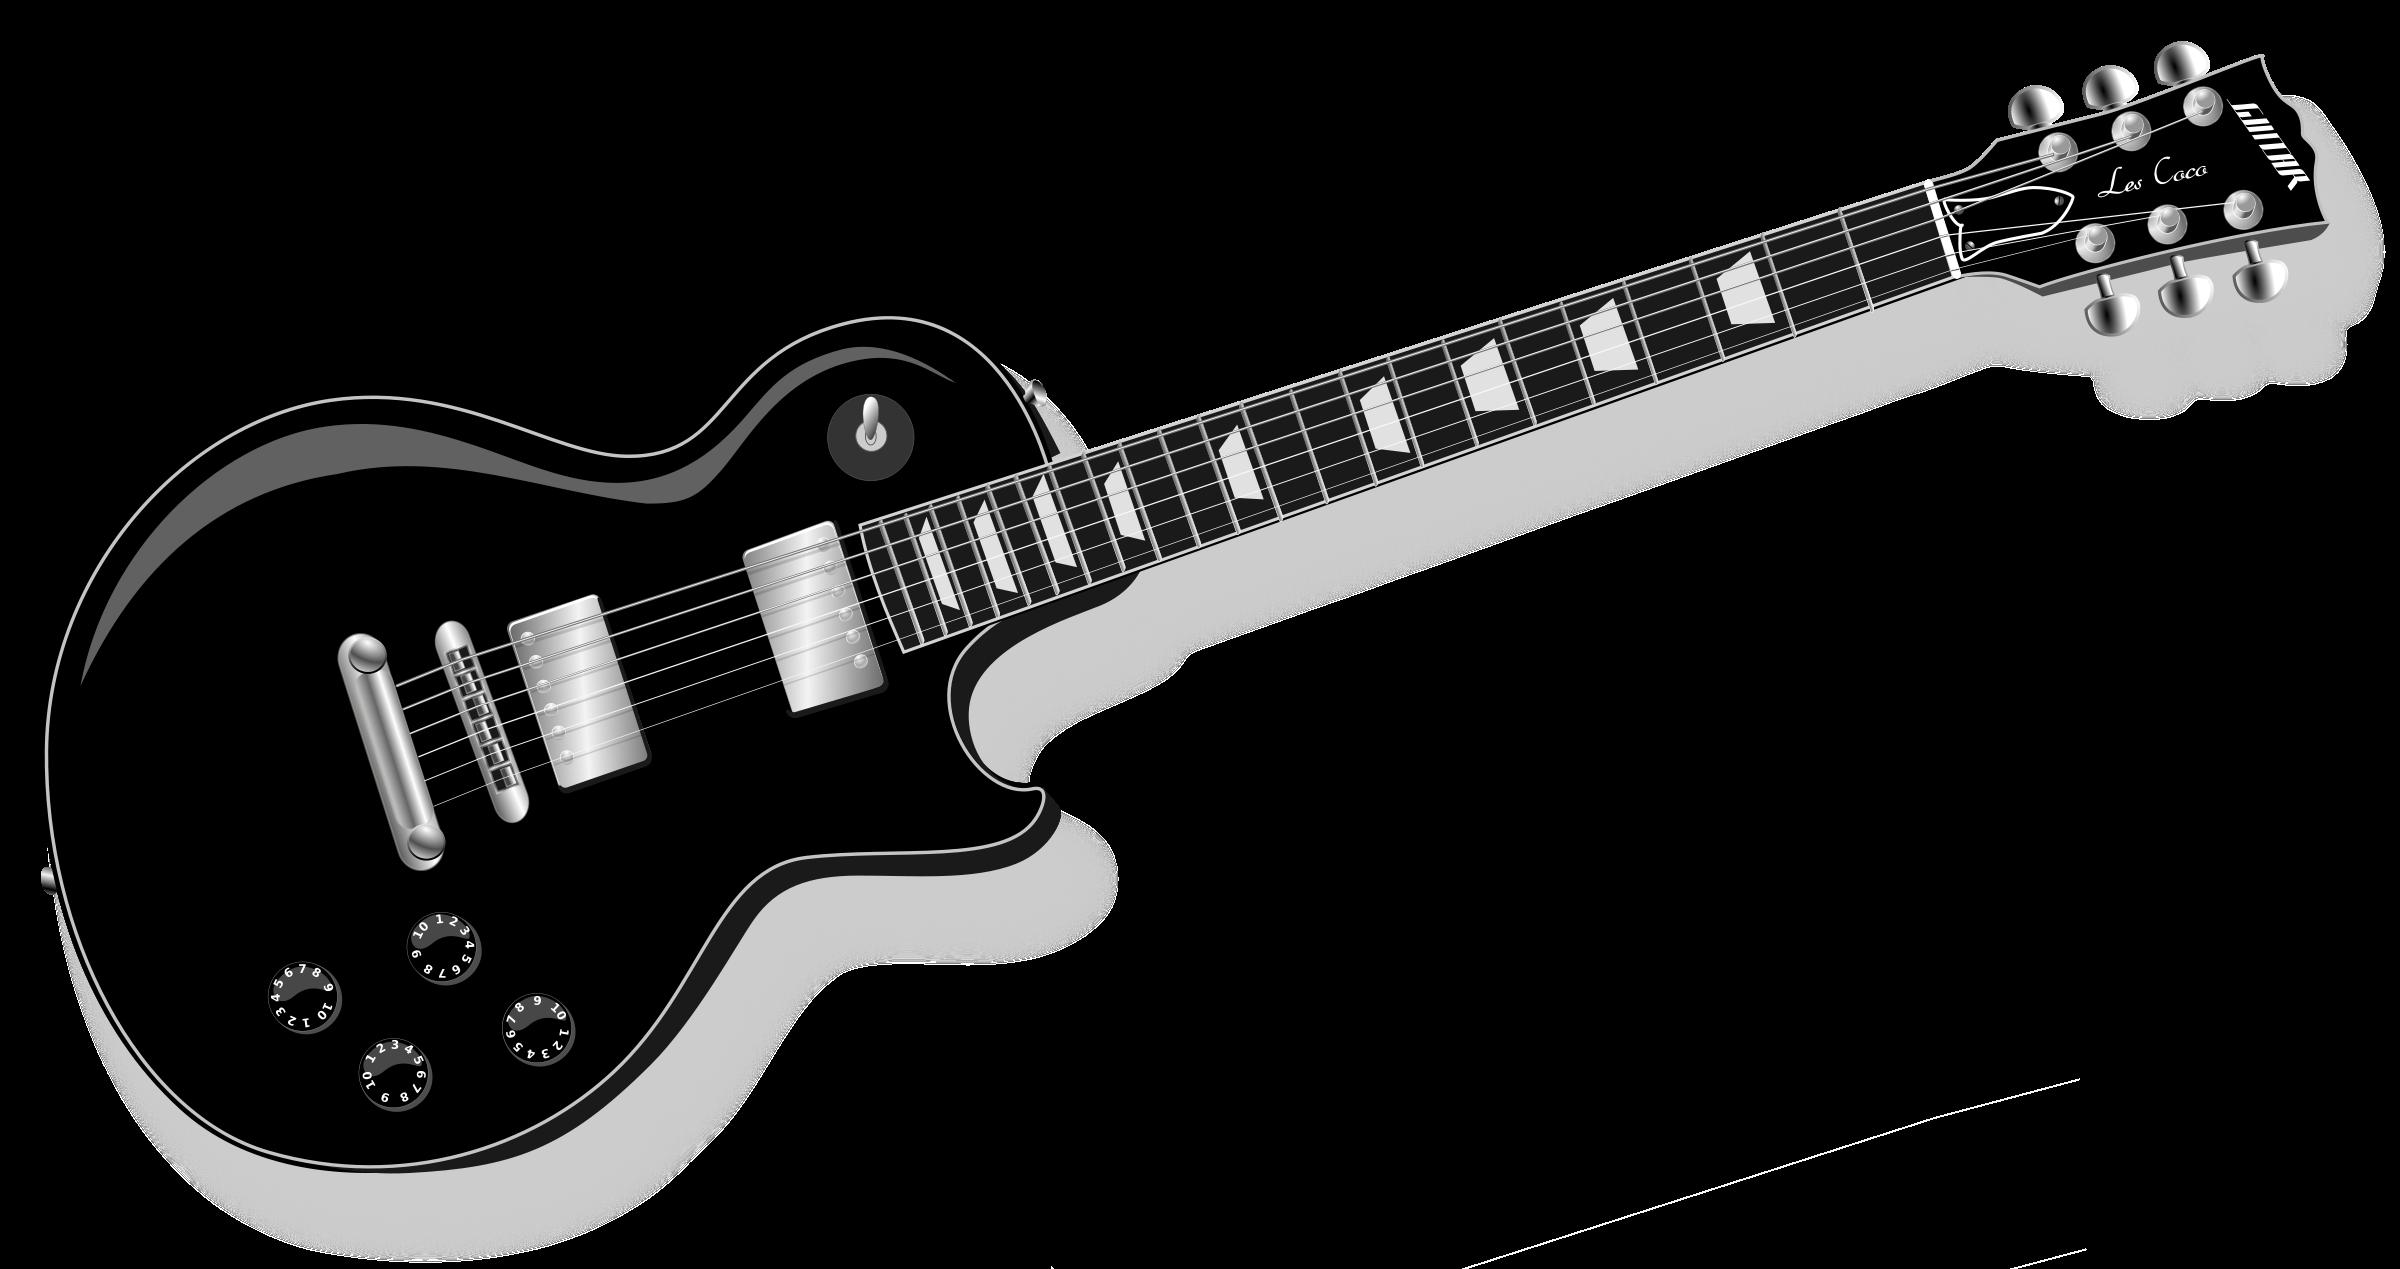 Guitar Clip Art Image Clipart Panda Free Clipart Images